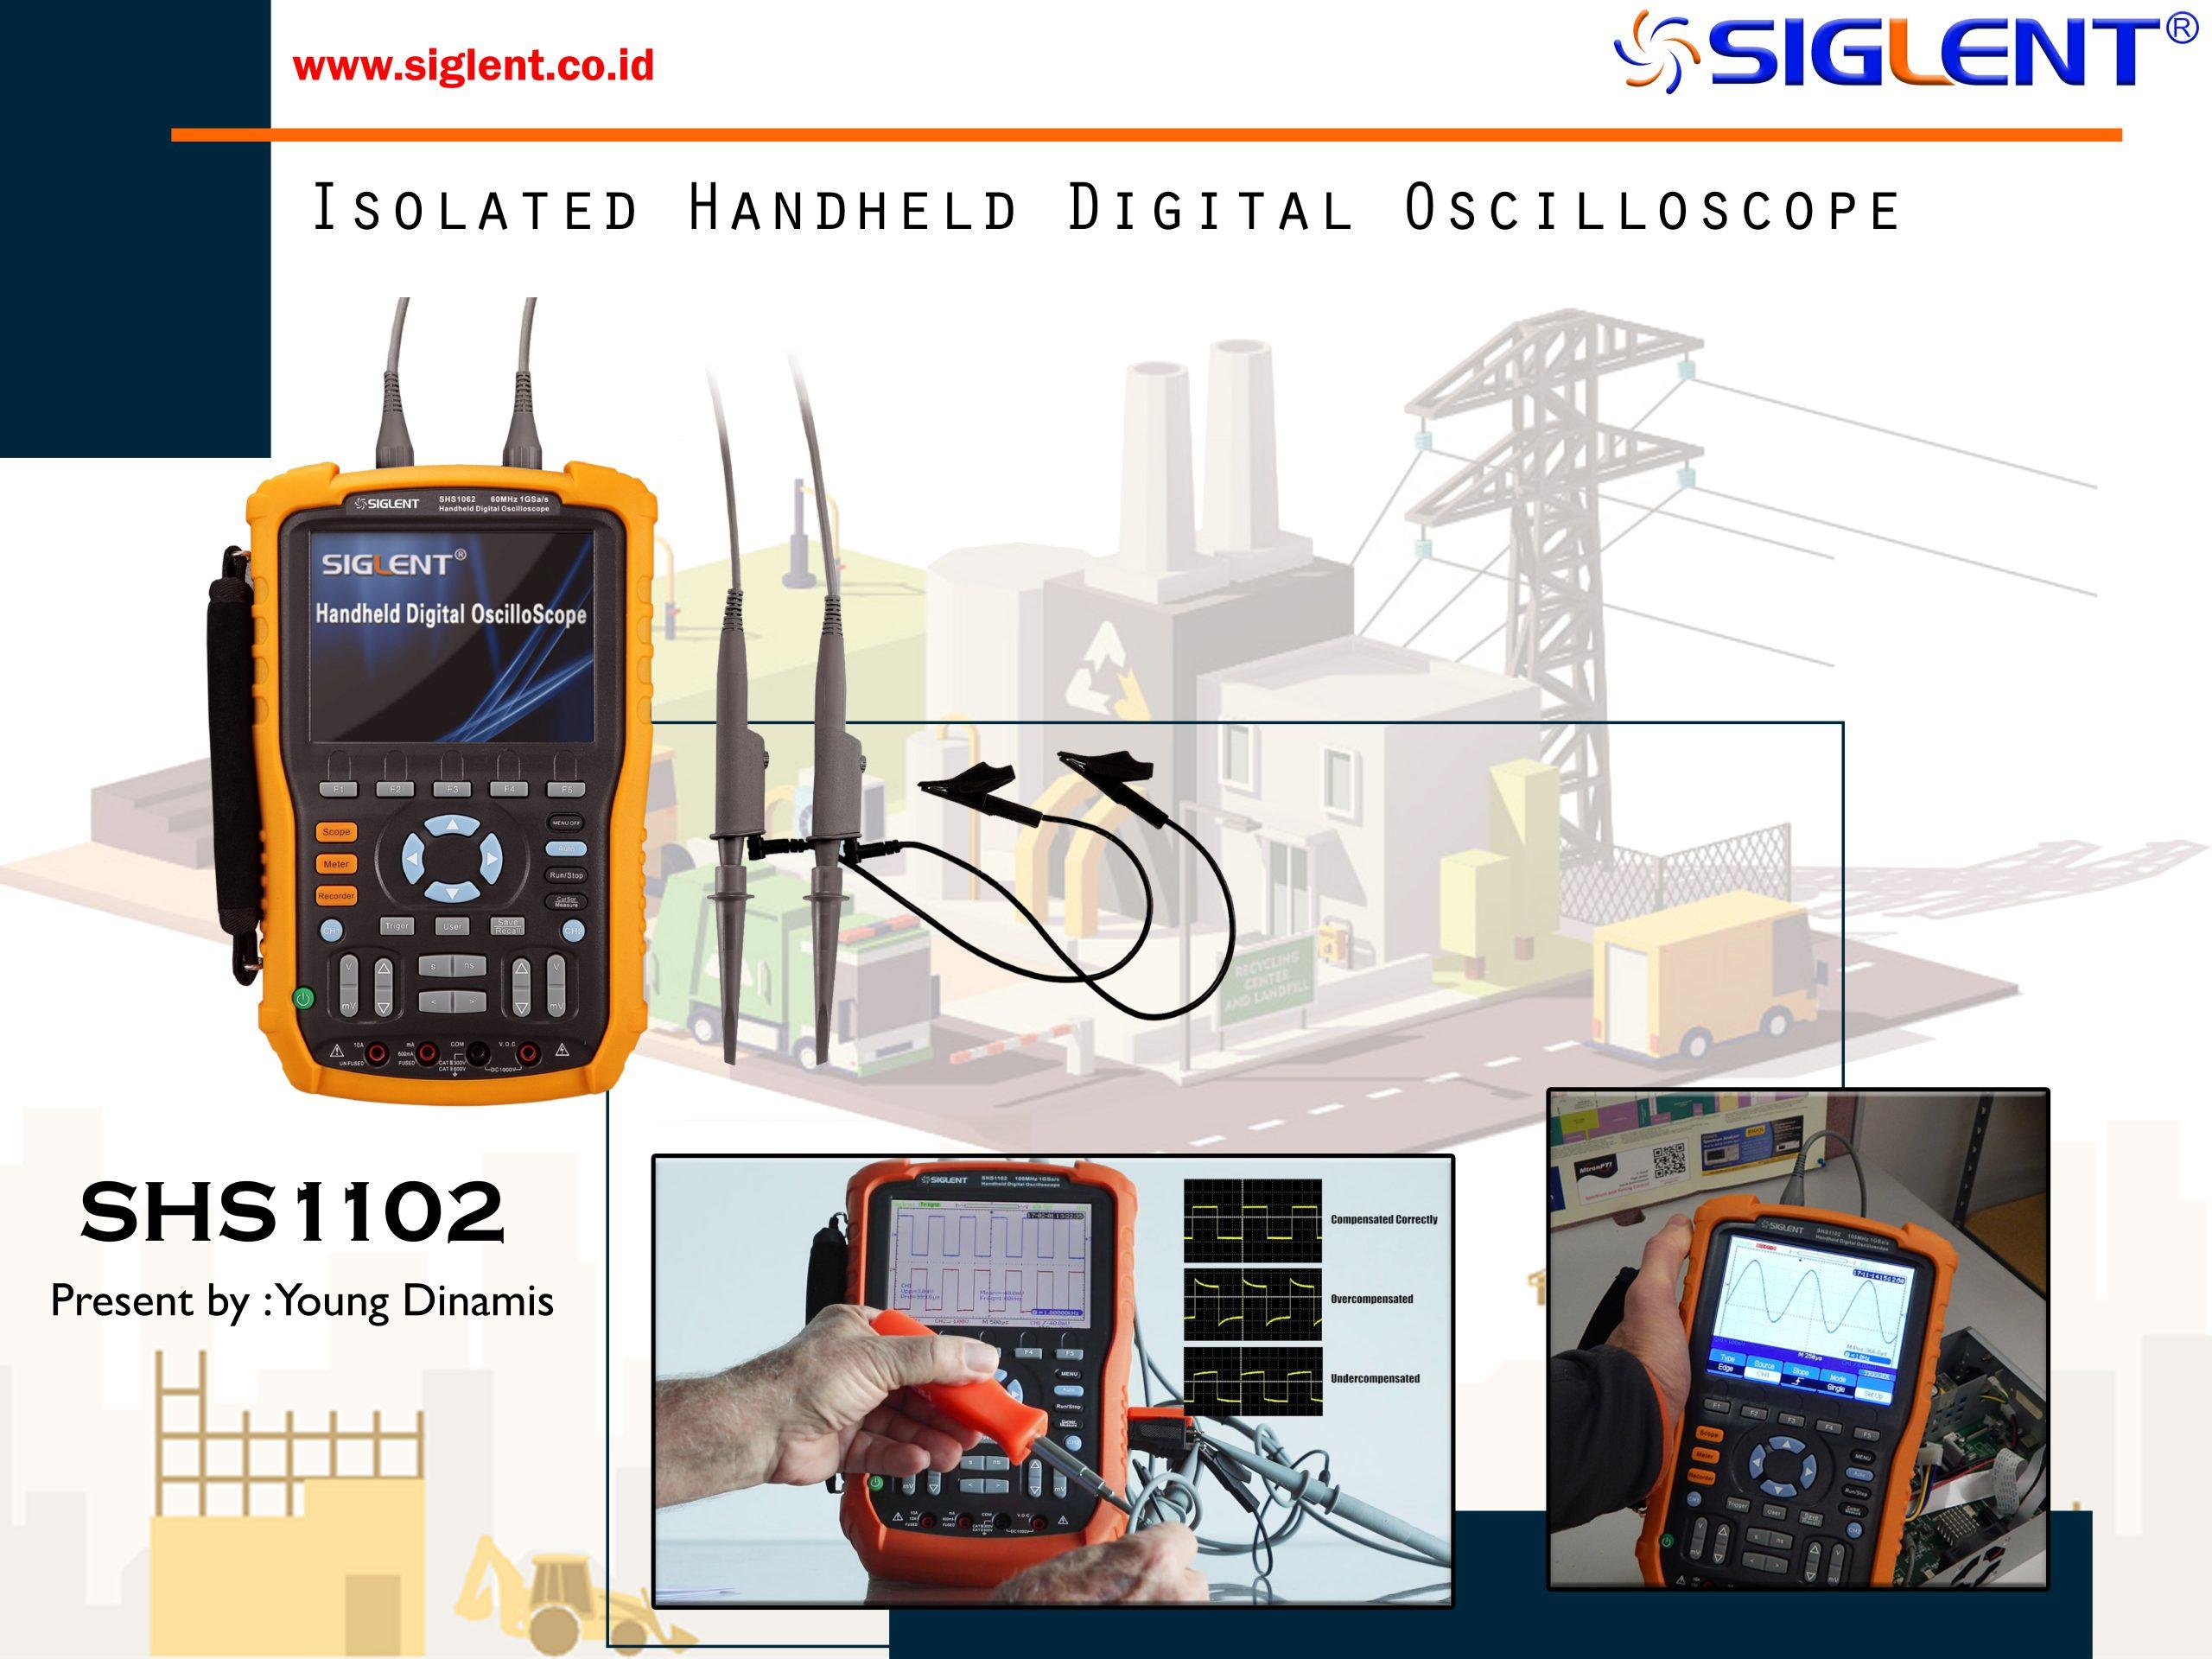 SHS1000 Isolated Handheld Digital Oscilloscope